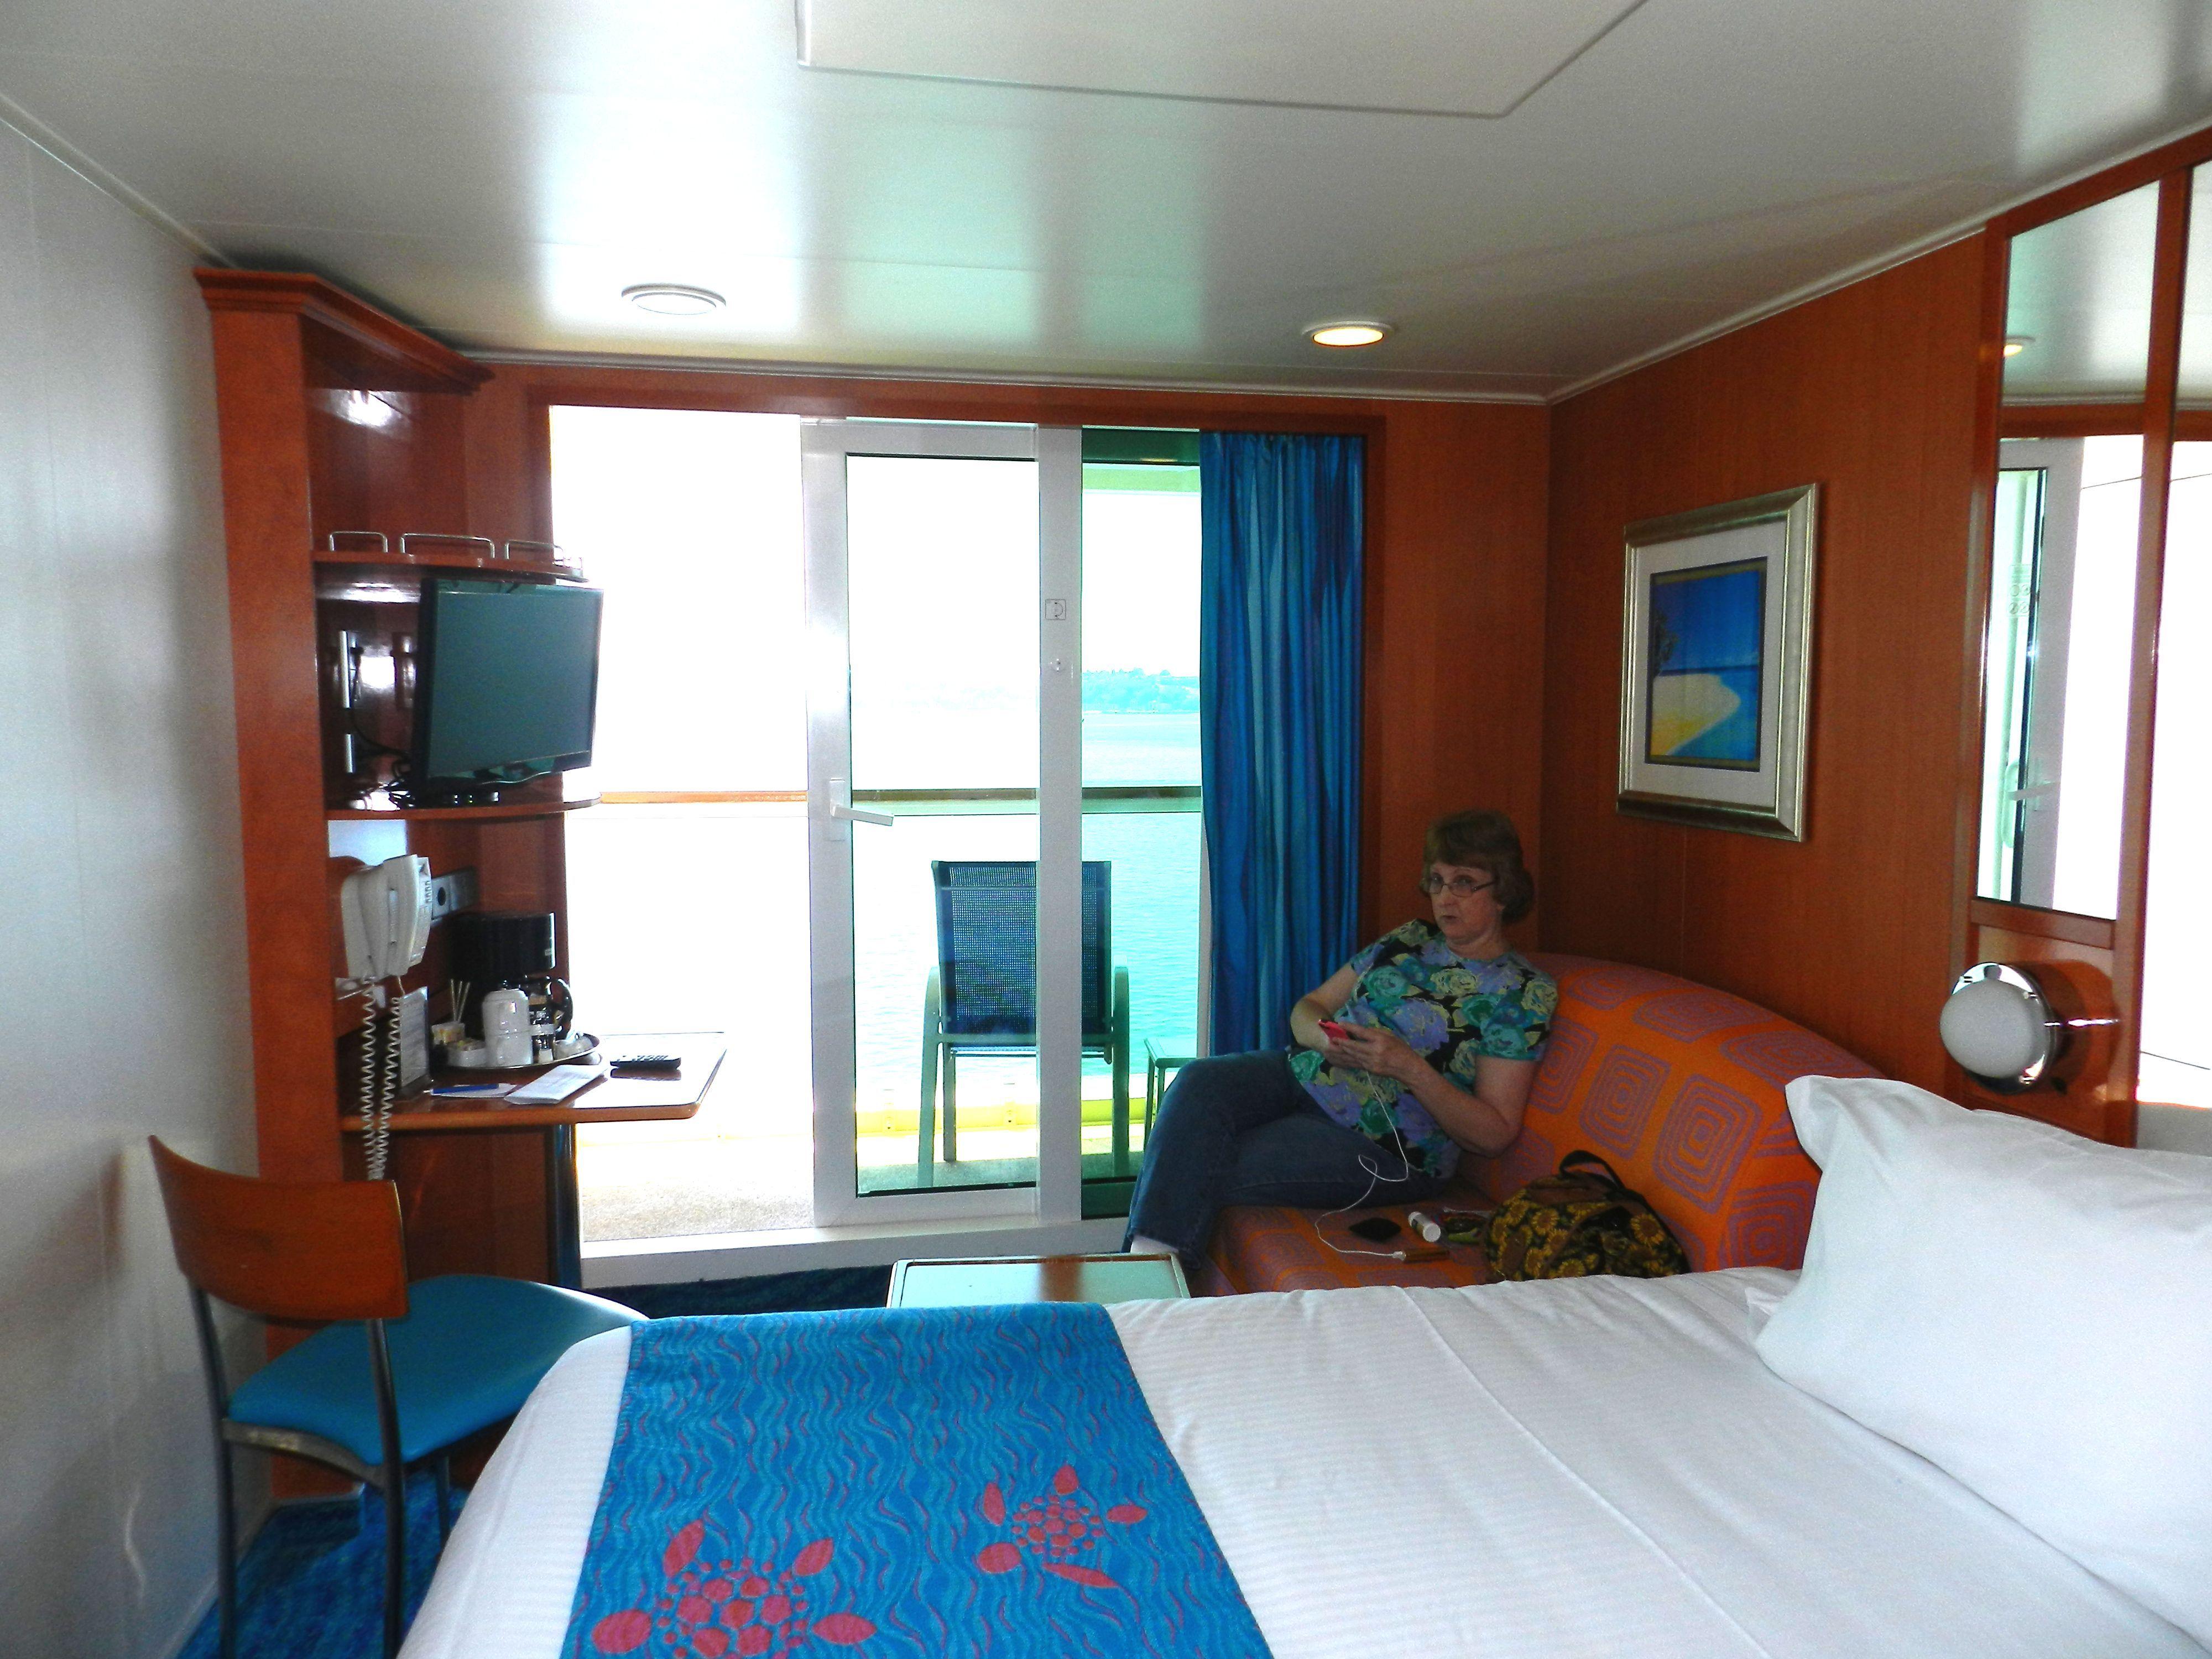 Norwegian jewel cruise review jul 12 2014 cruise like for Alaska cruise balcony room